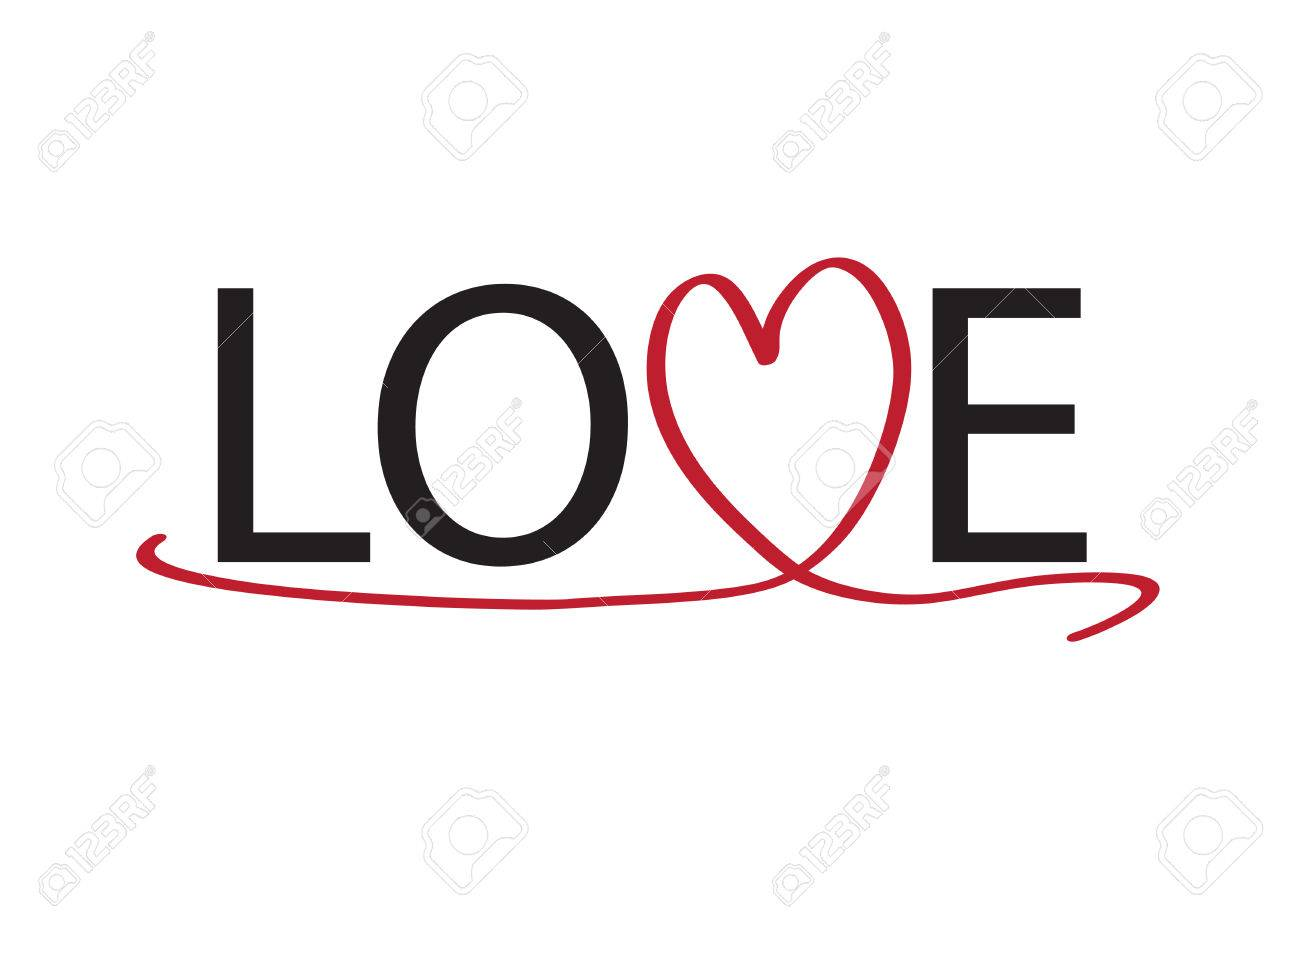 Love Text with Heart Ribbon Stok Fotoğr-Love Text with Heart Ribbon Stok Fotoğraf - 65494736-10